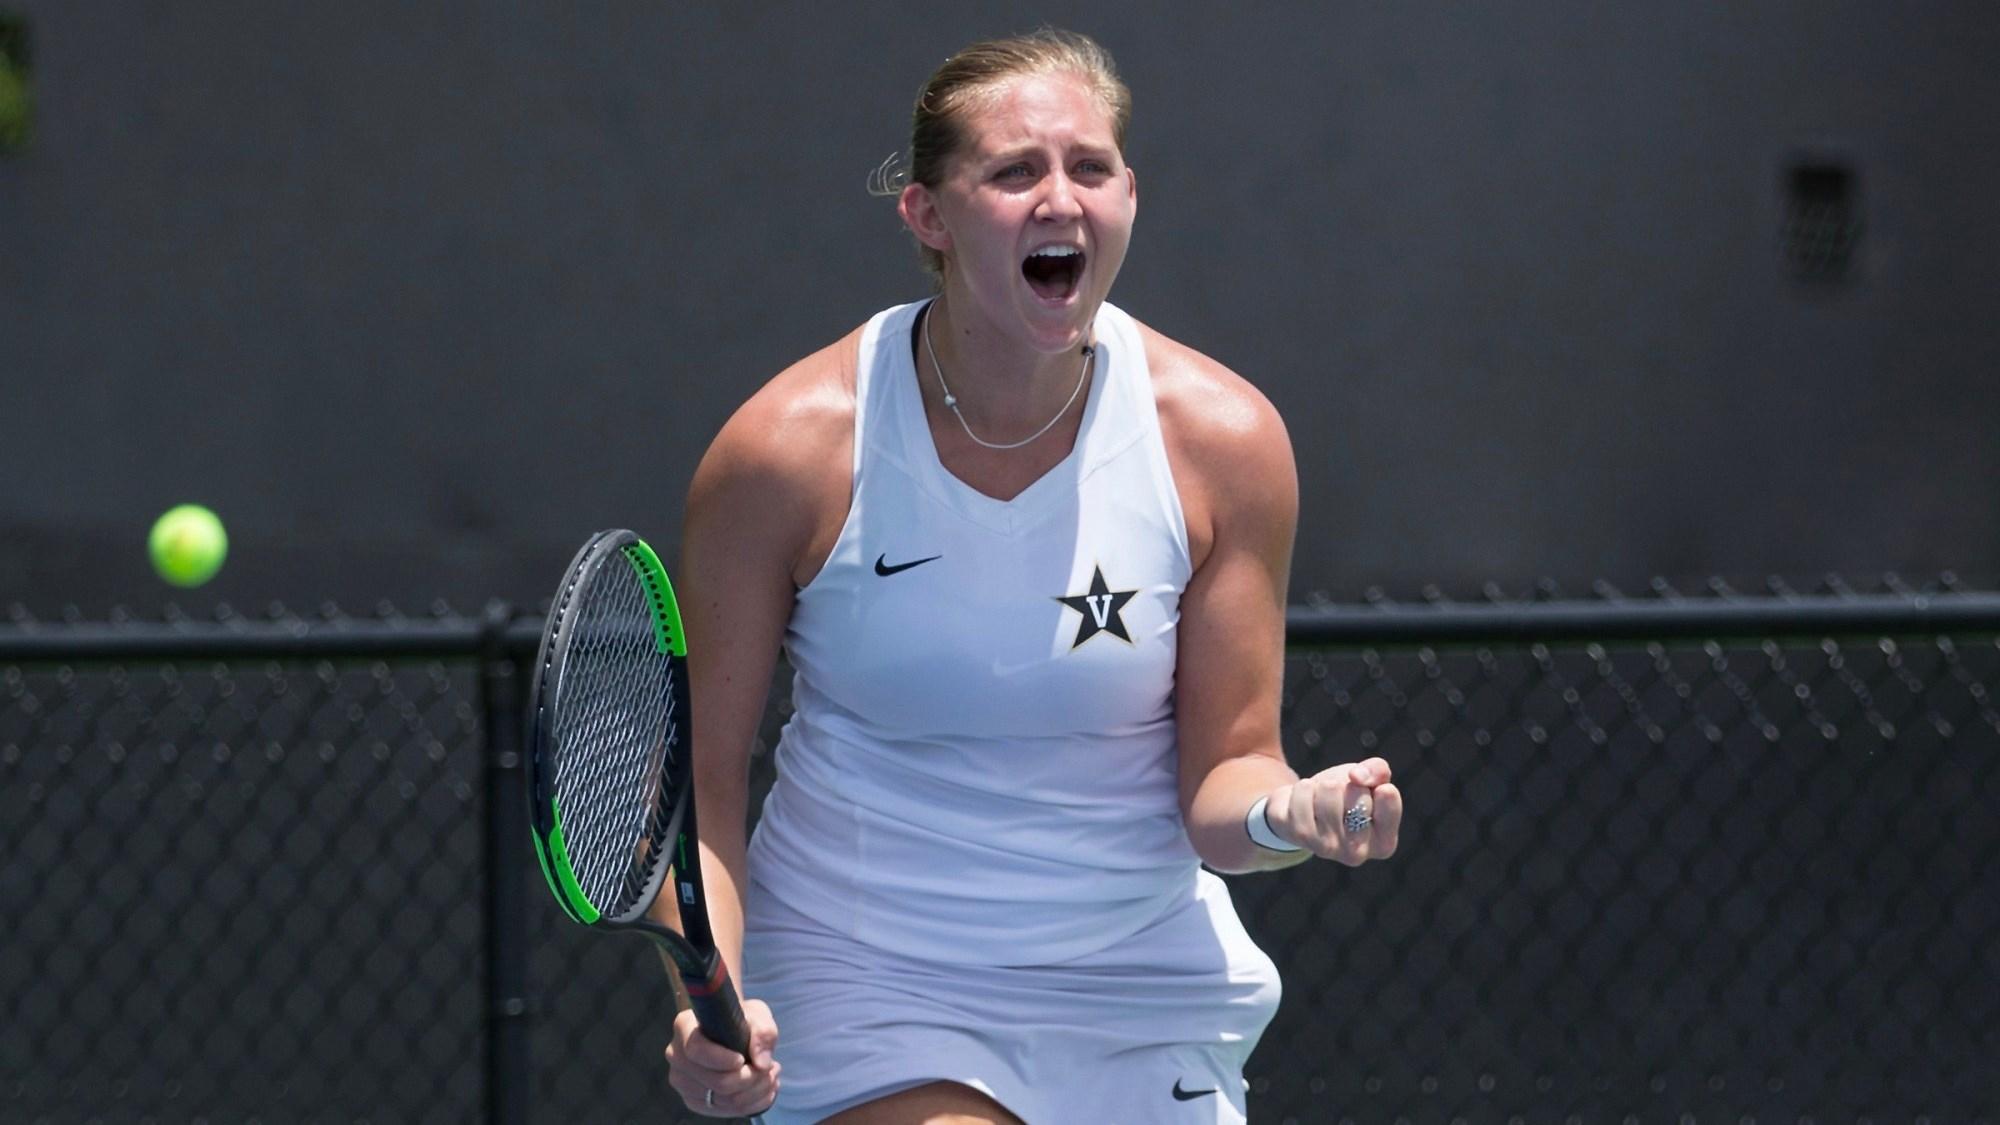 W. tennis Emily Smith celebration